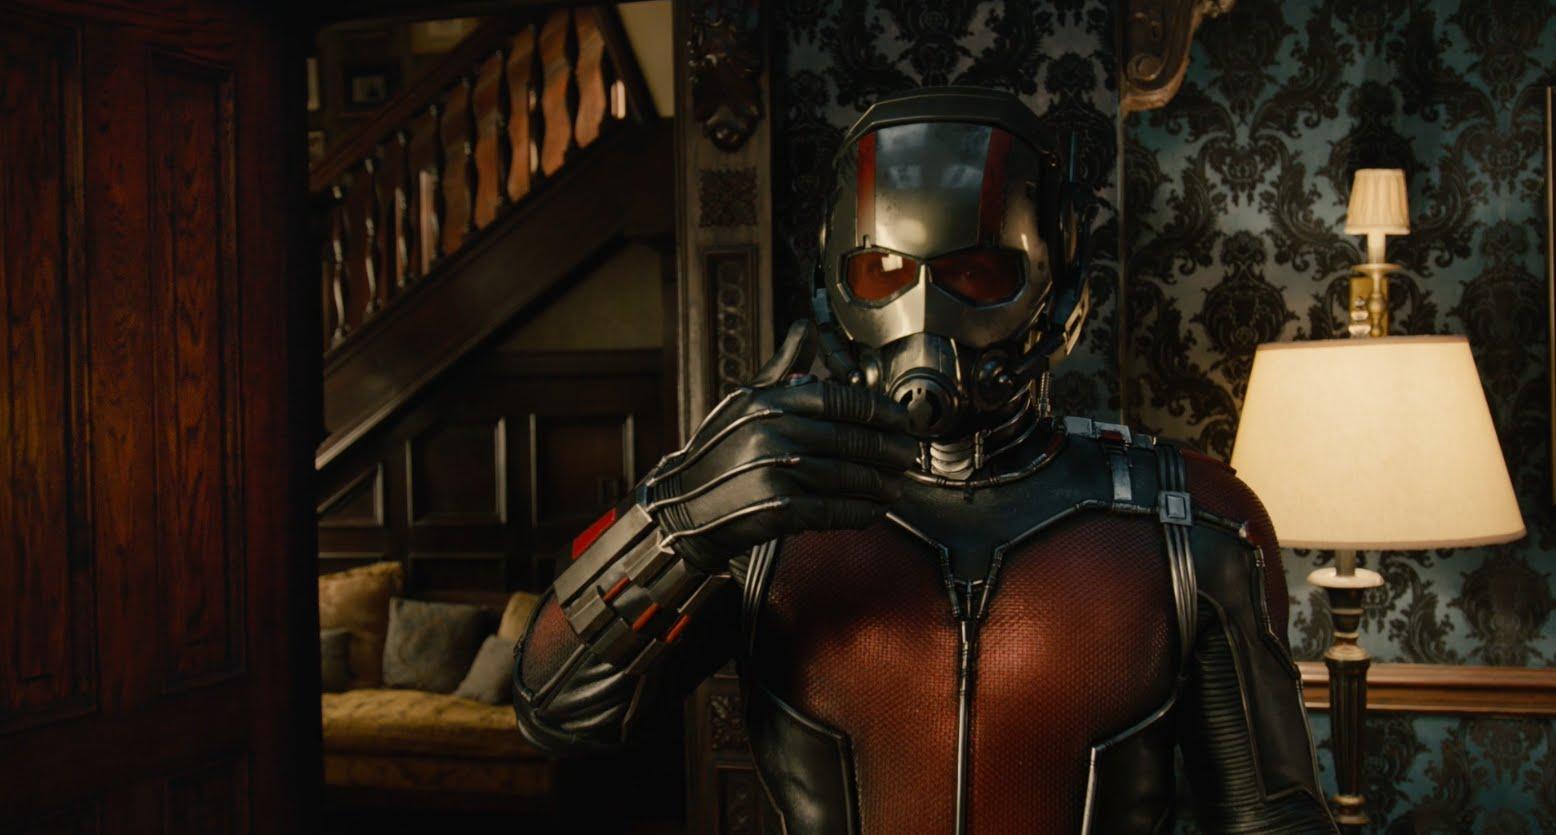 Marvel's Ant-Man - Trailer 2 | HD